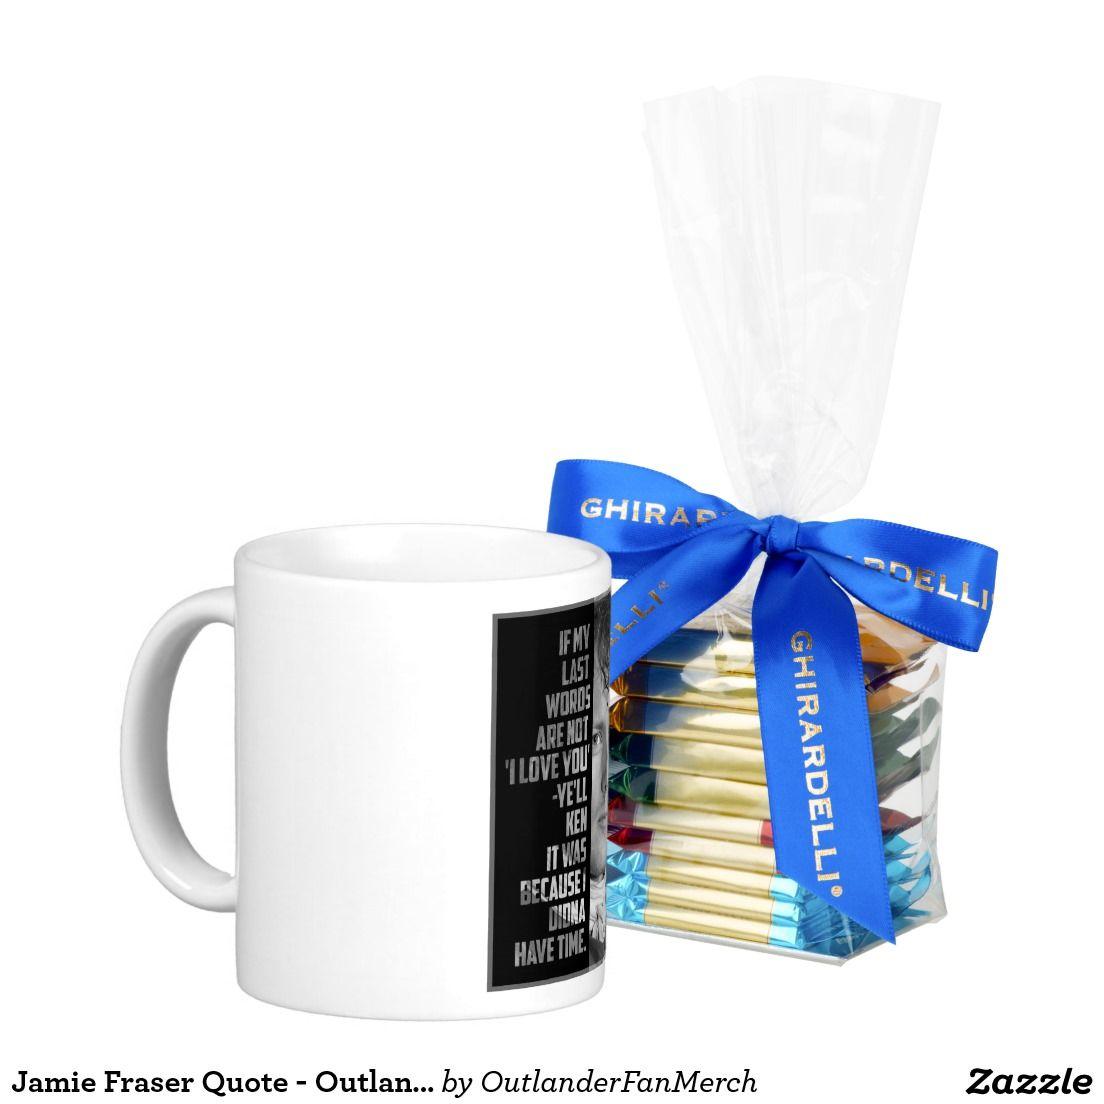 Jamie Fraser Quote - Outlander Classic White Coffee Mug